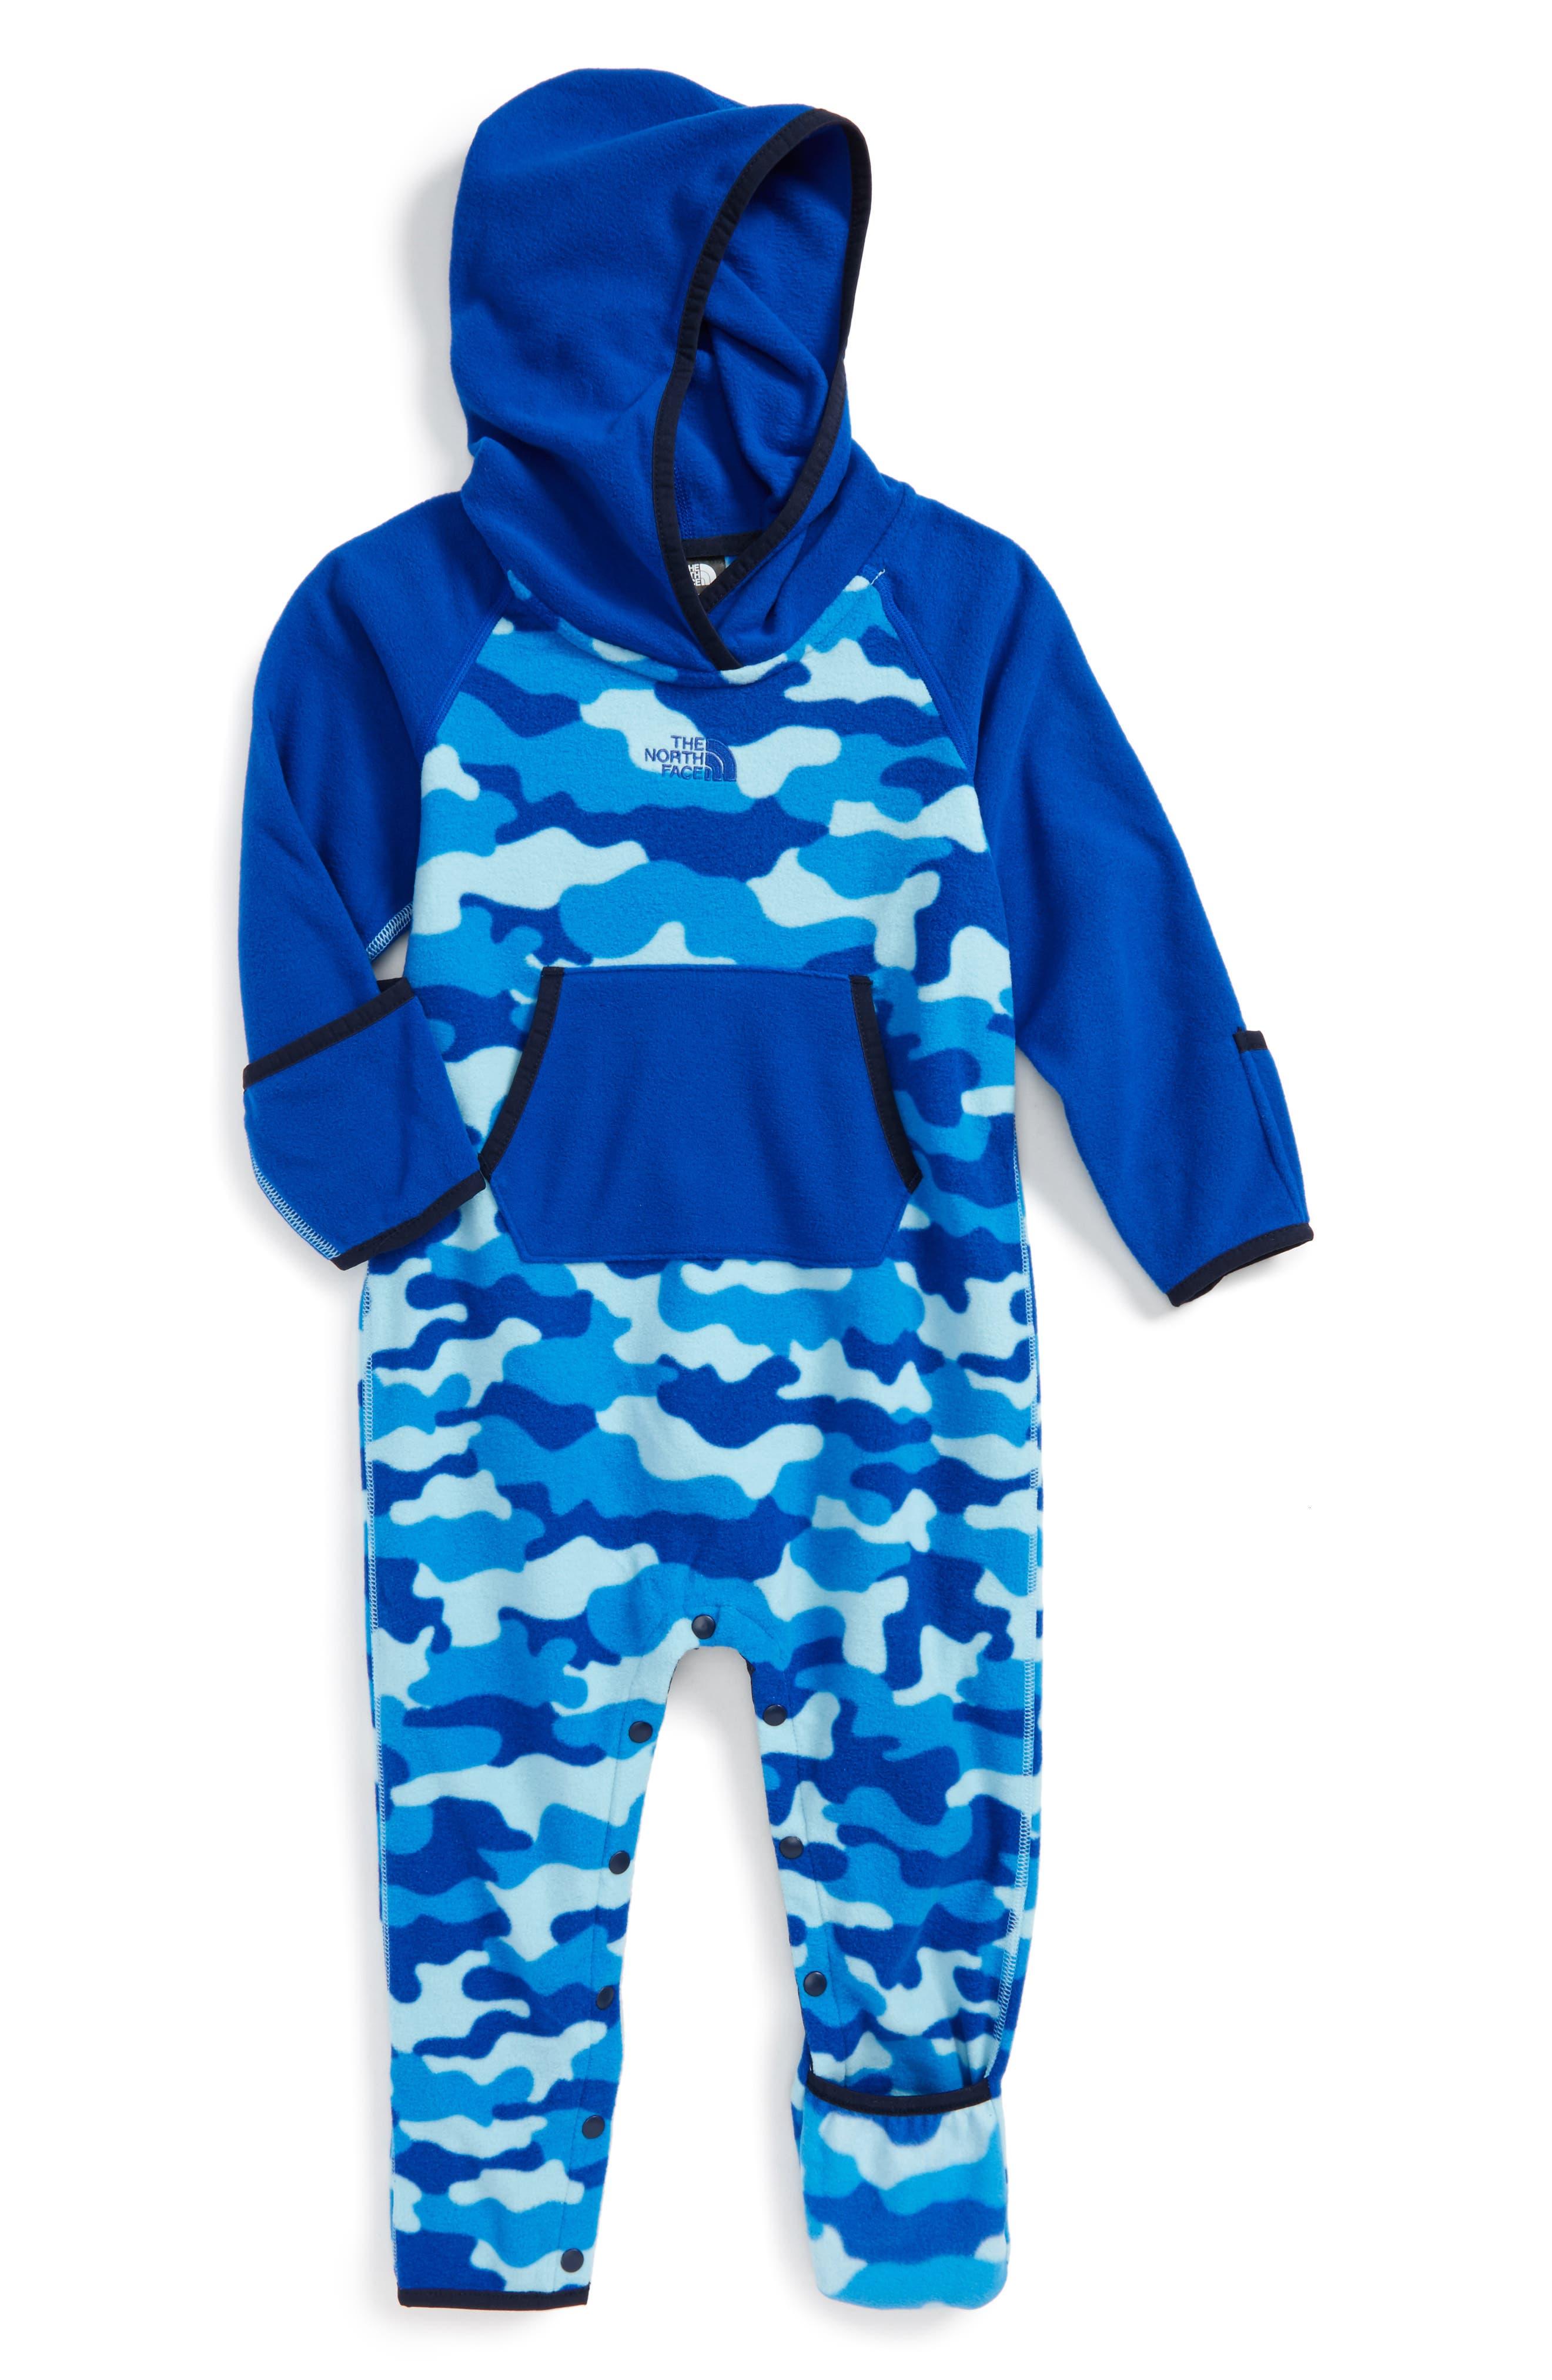 The North Face 'Glacier' One-Piece (Baby Boys) (Regular Retail Price: $50.00)